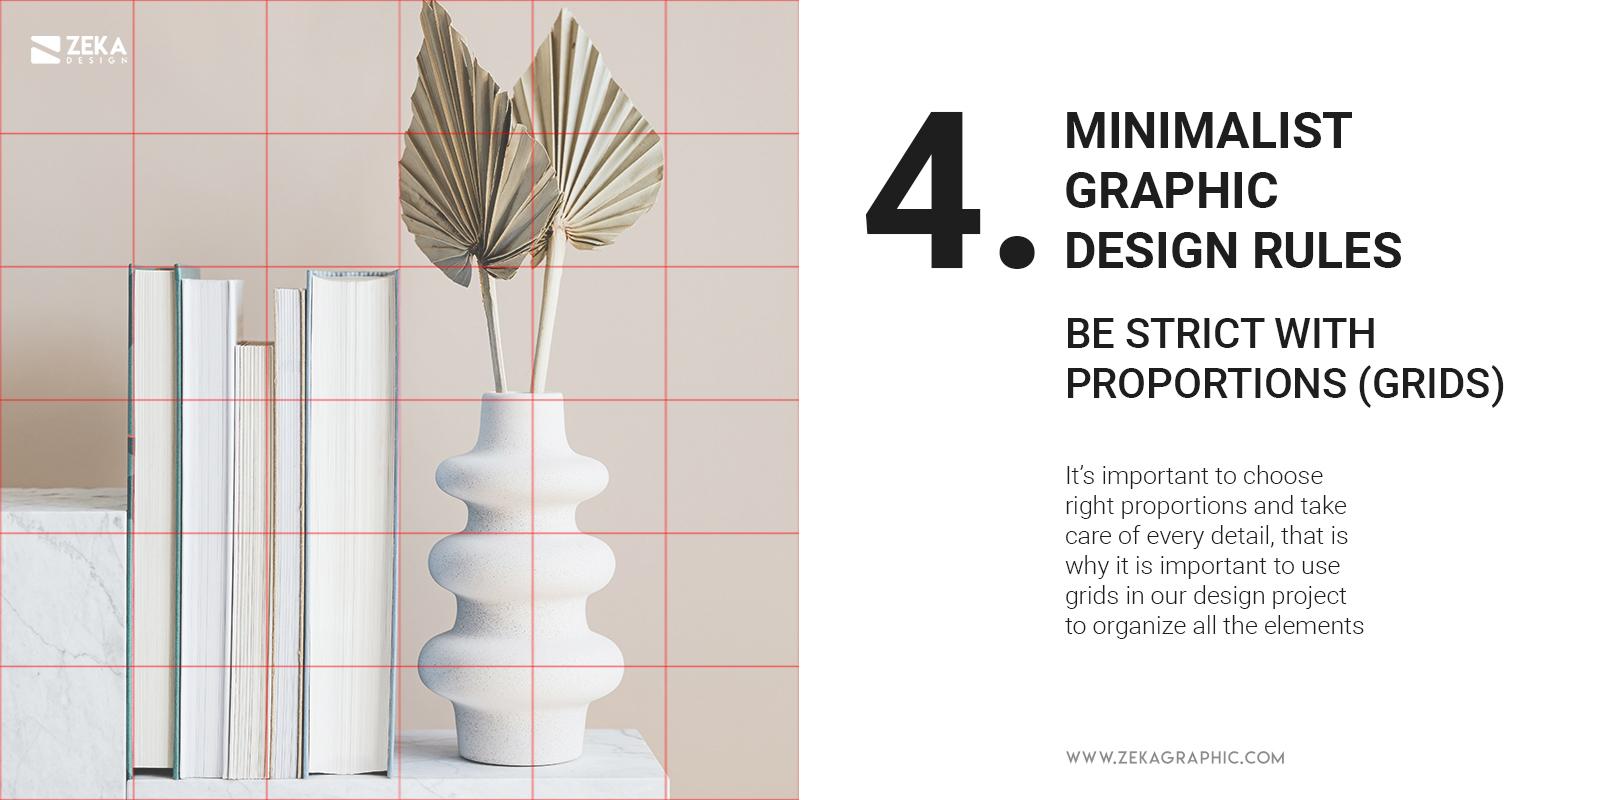 4 Minimalist Graphic Design Rules Grids Organize